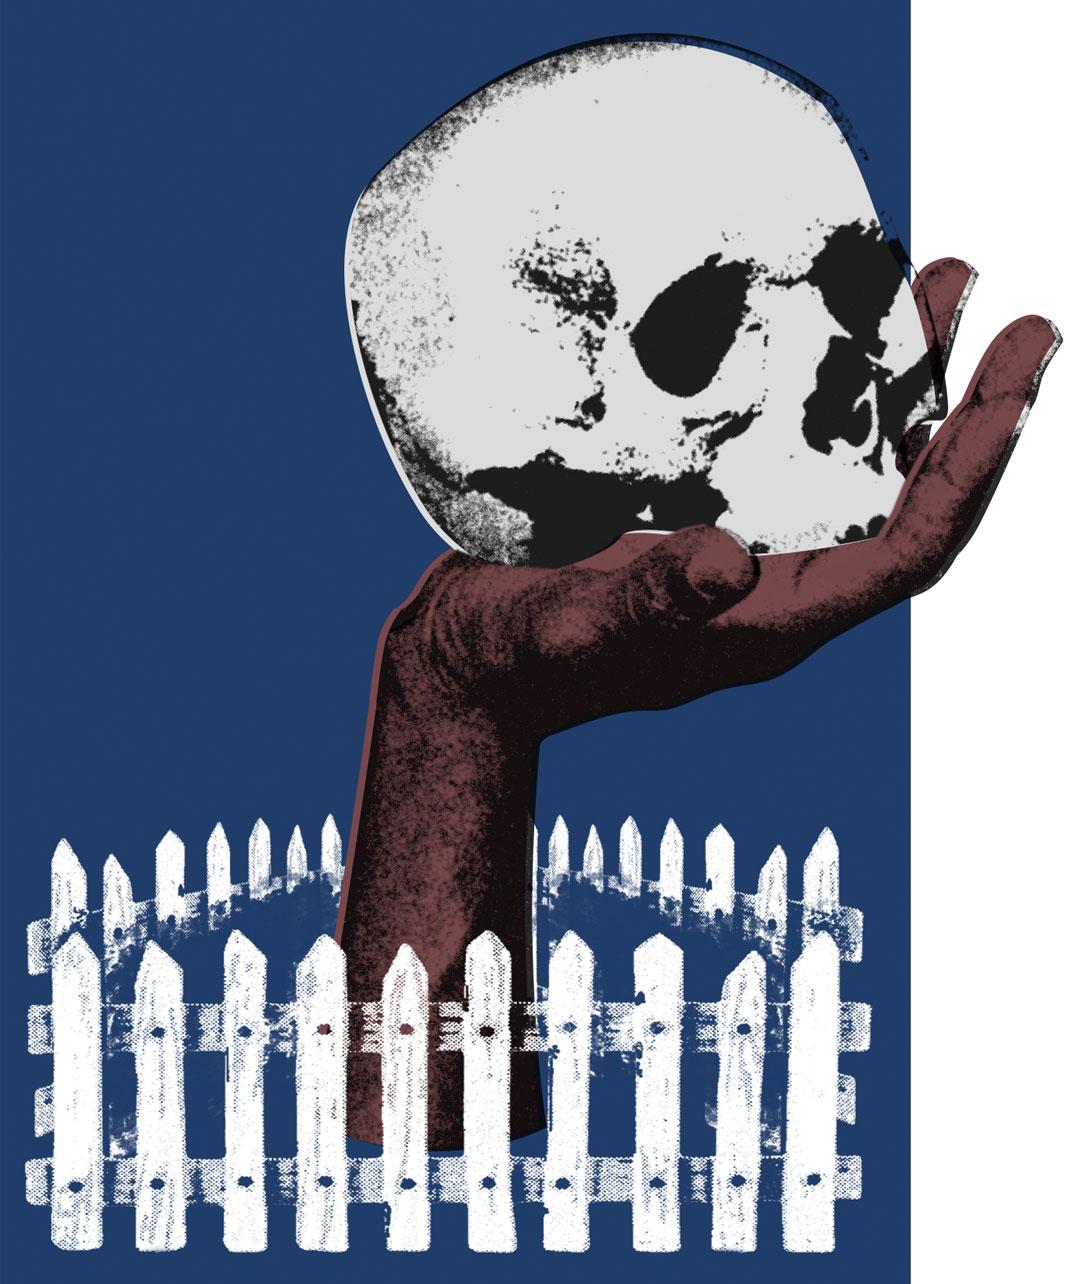 Theatre Illustration by Adam Maida